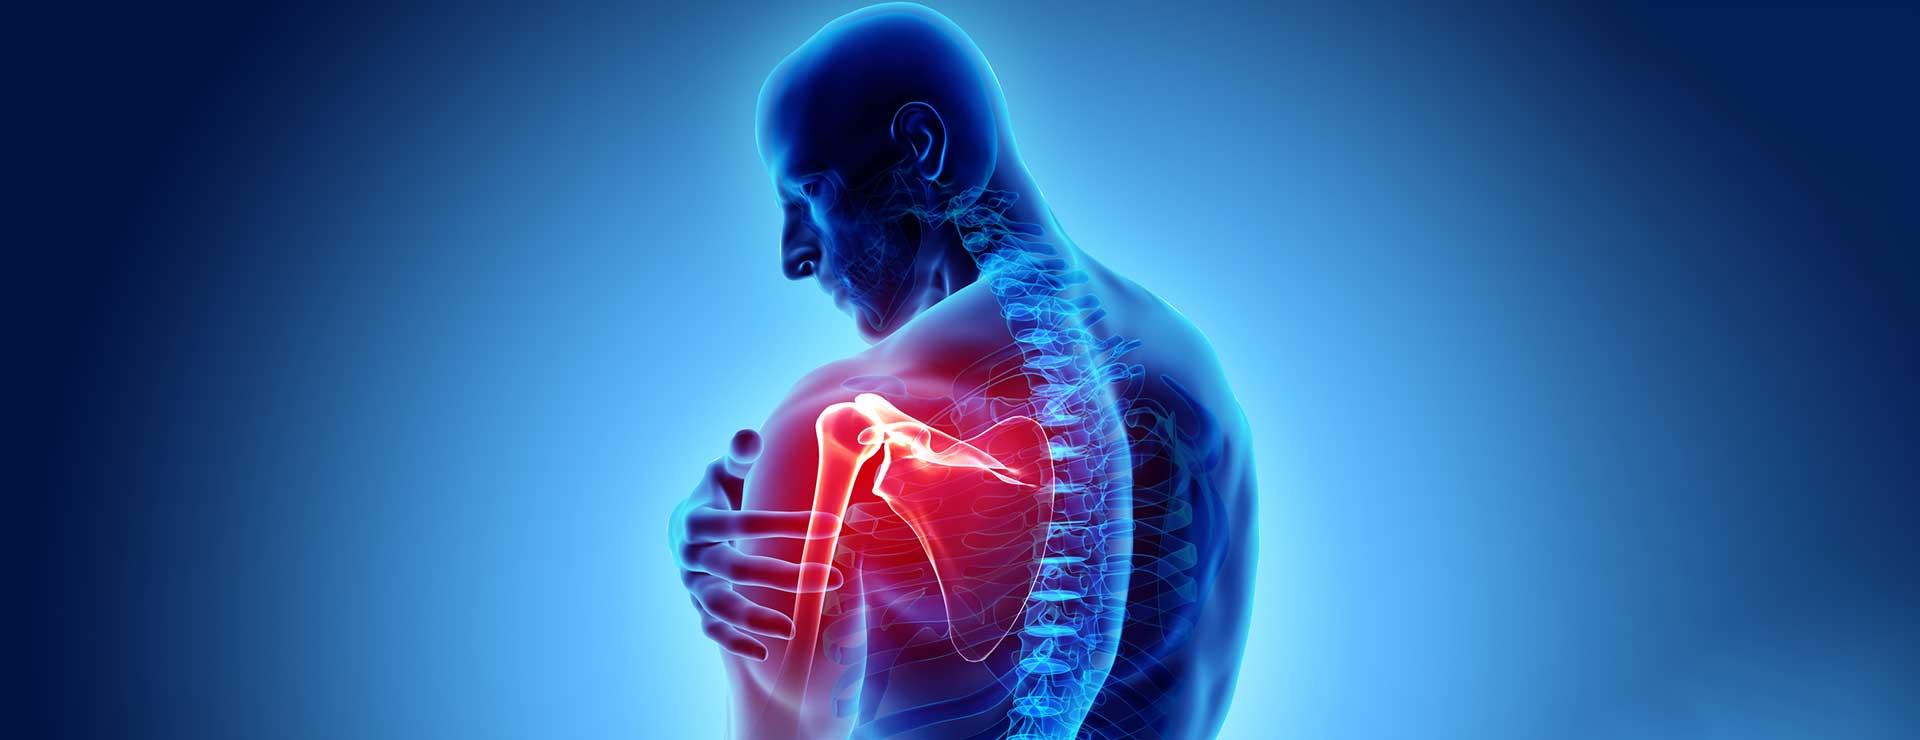 Shoulder Arthritis | Johns Hopkins Medicine